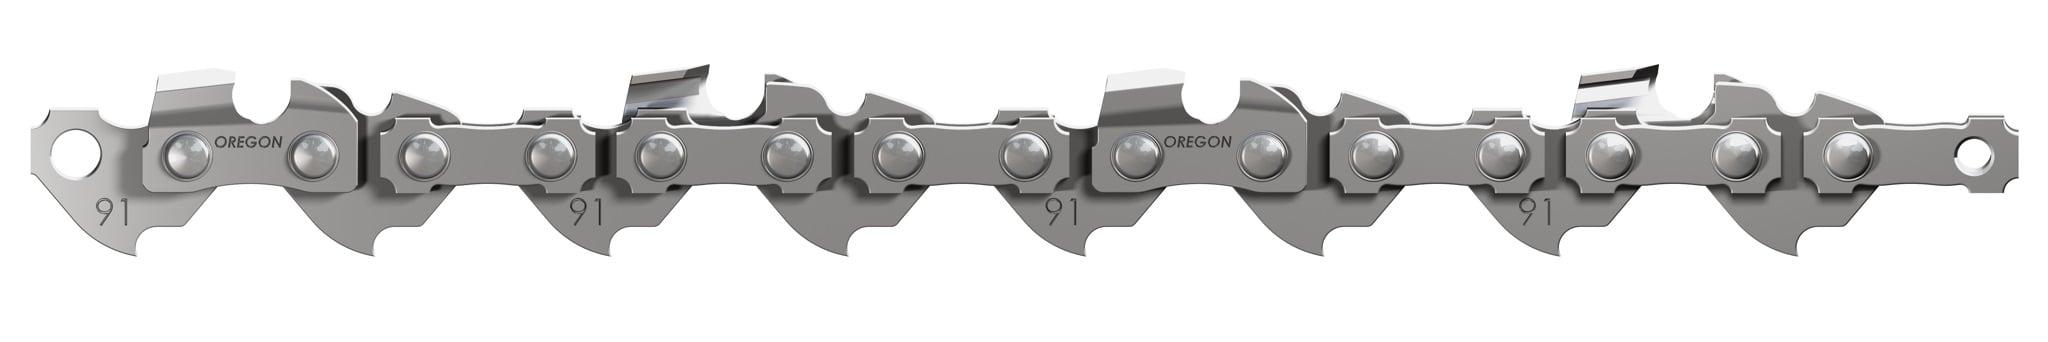 Lant Oregon 91P Standard